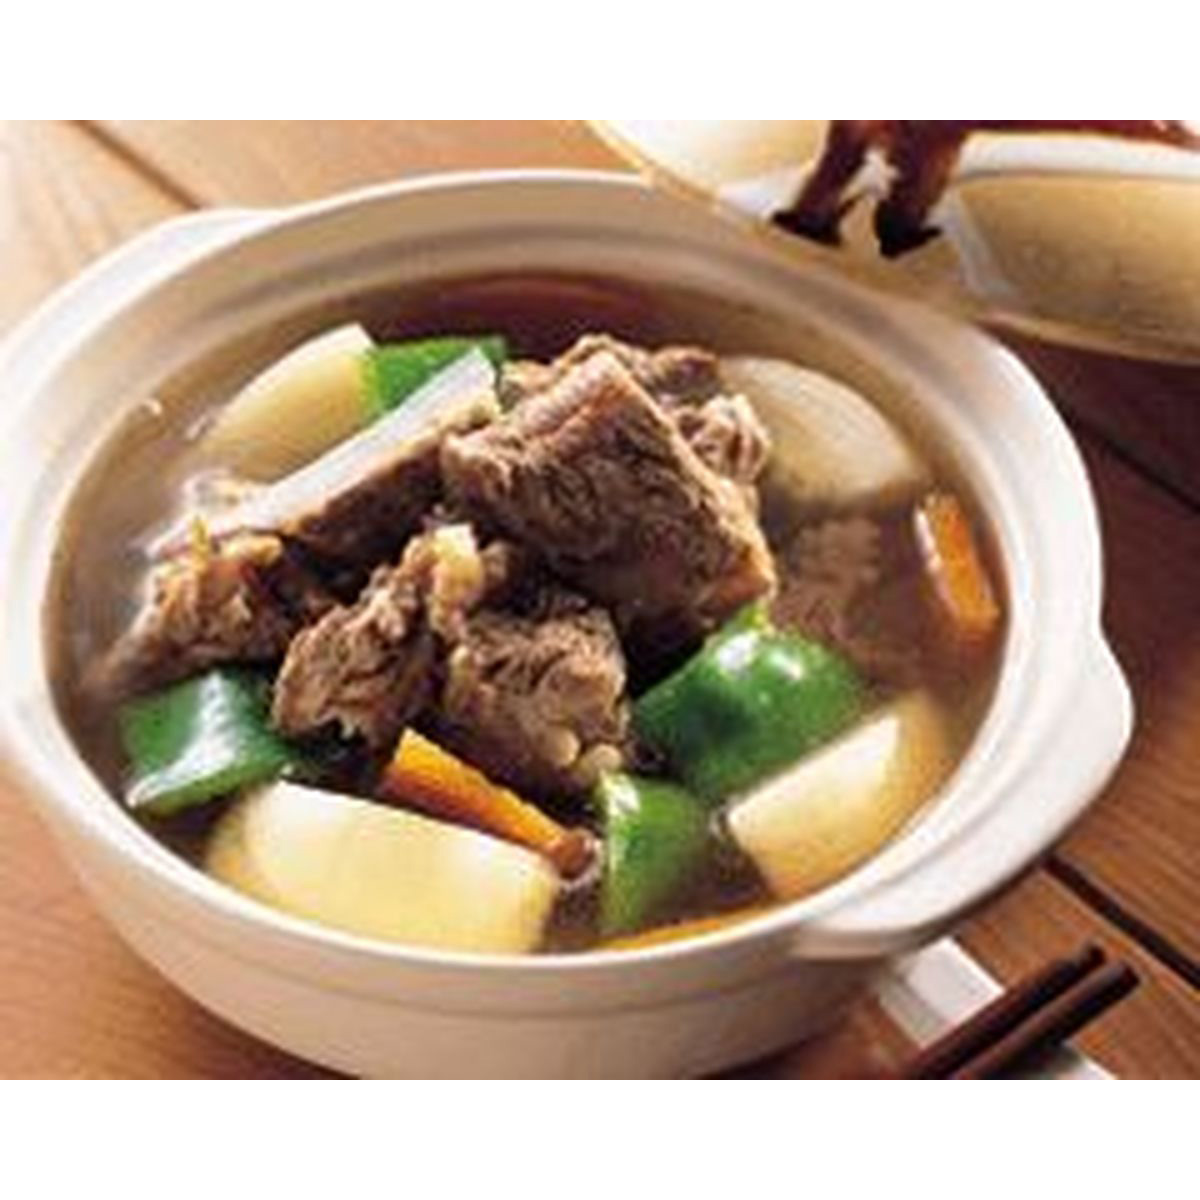 食譜:牛雜火鍋